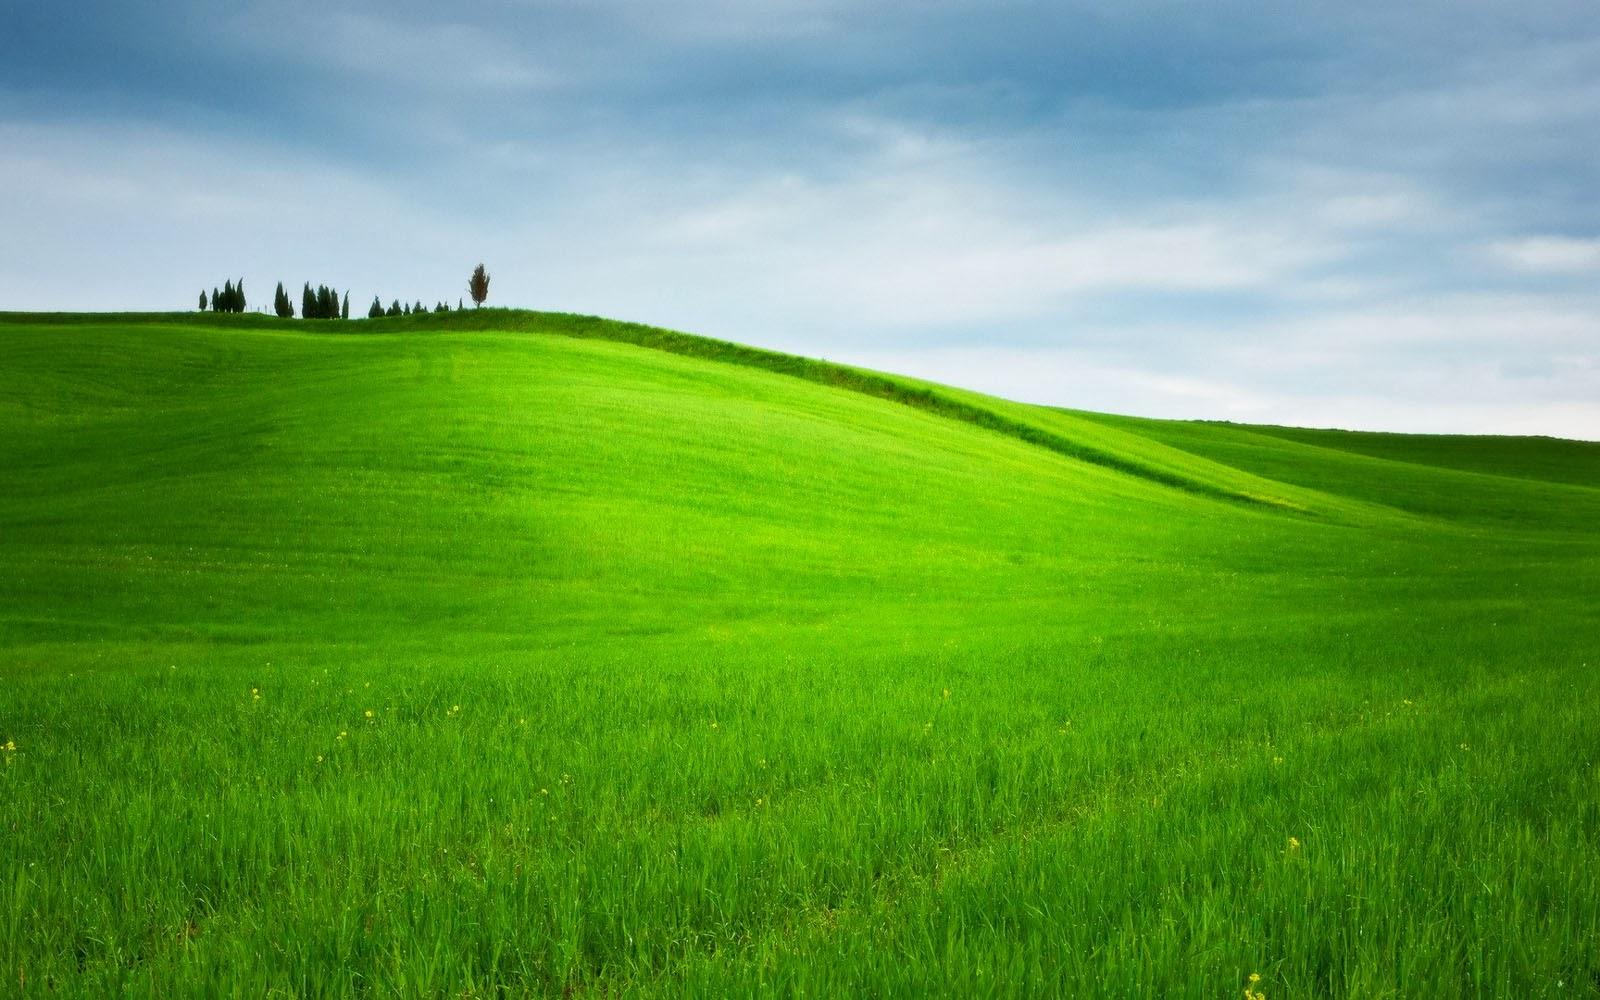 hills wallpapers grassy hills desktop wallpapers grassy hills desktop 1600x1000